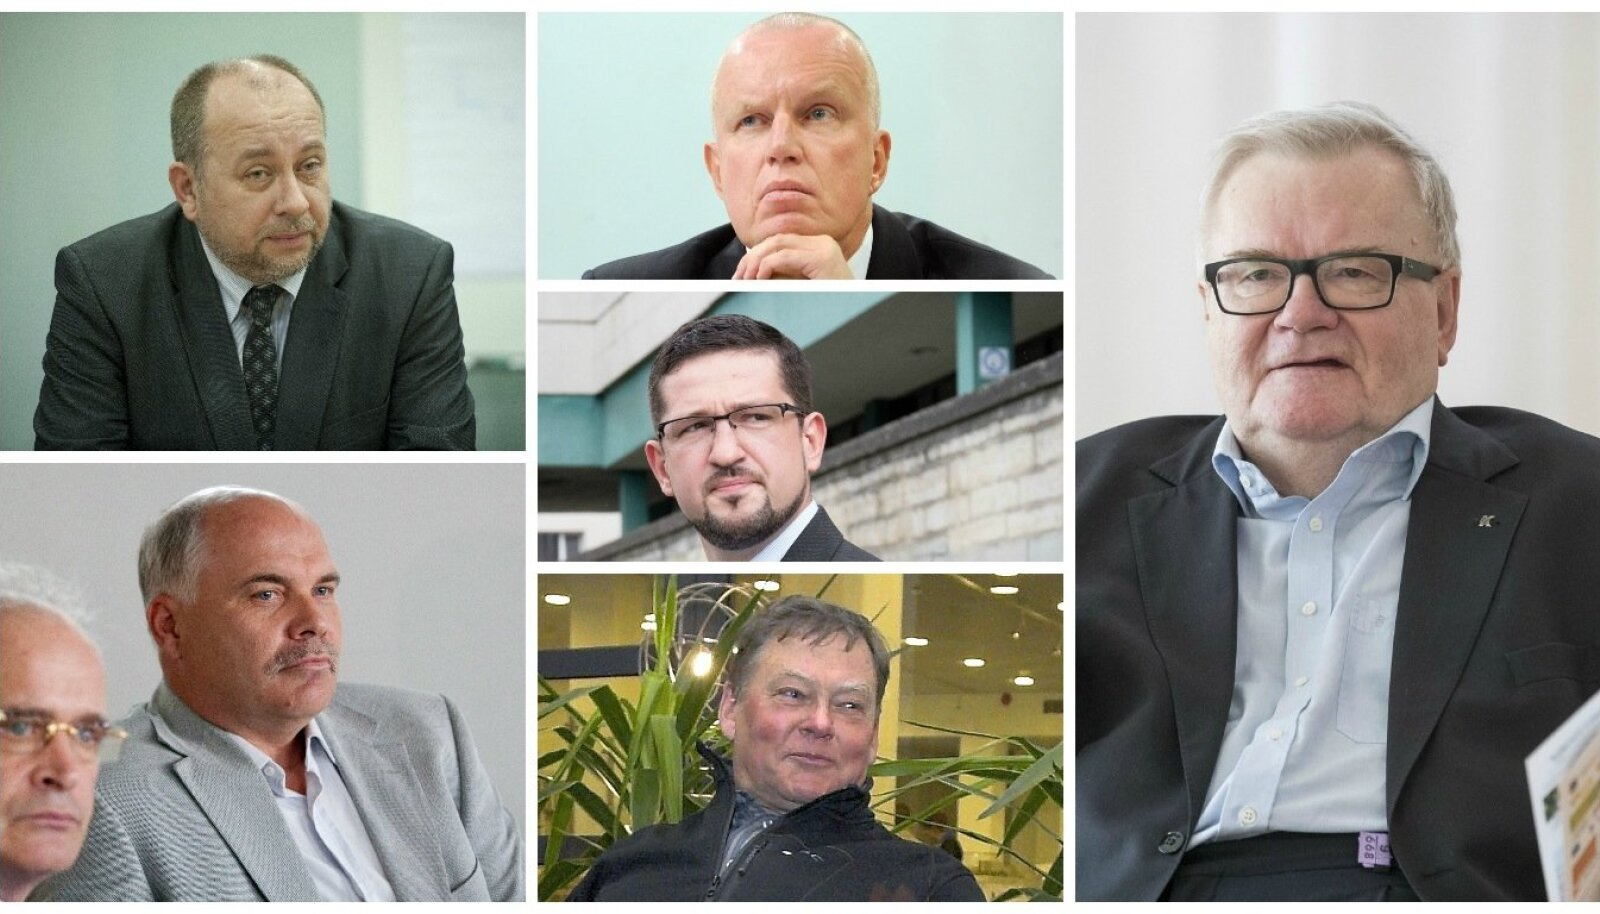 Ivo Parbus, Elmar Sepp, Edgar Savisaar, Toomas Õispuu, Alar Nääme, Mati Songisepp